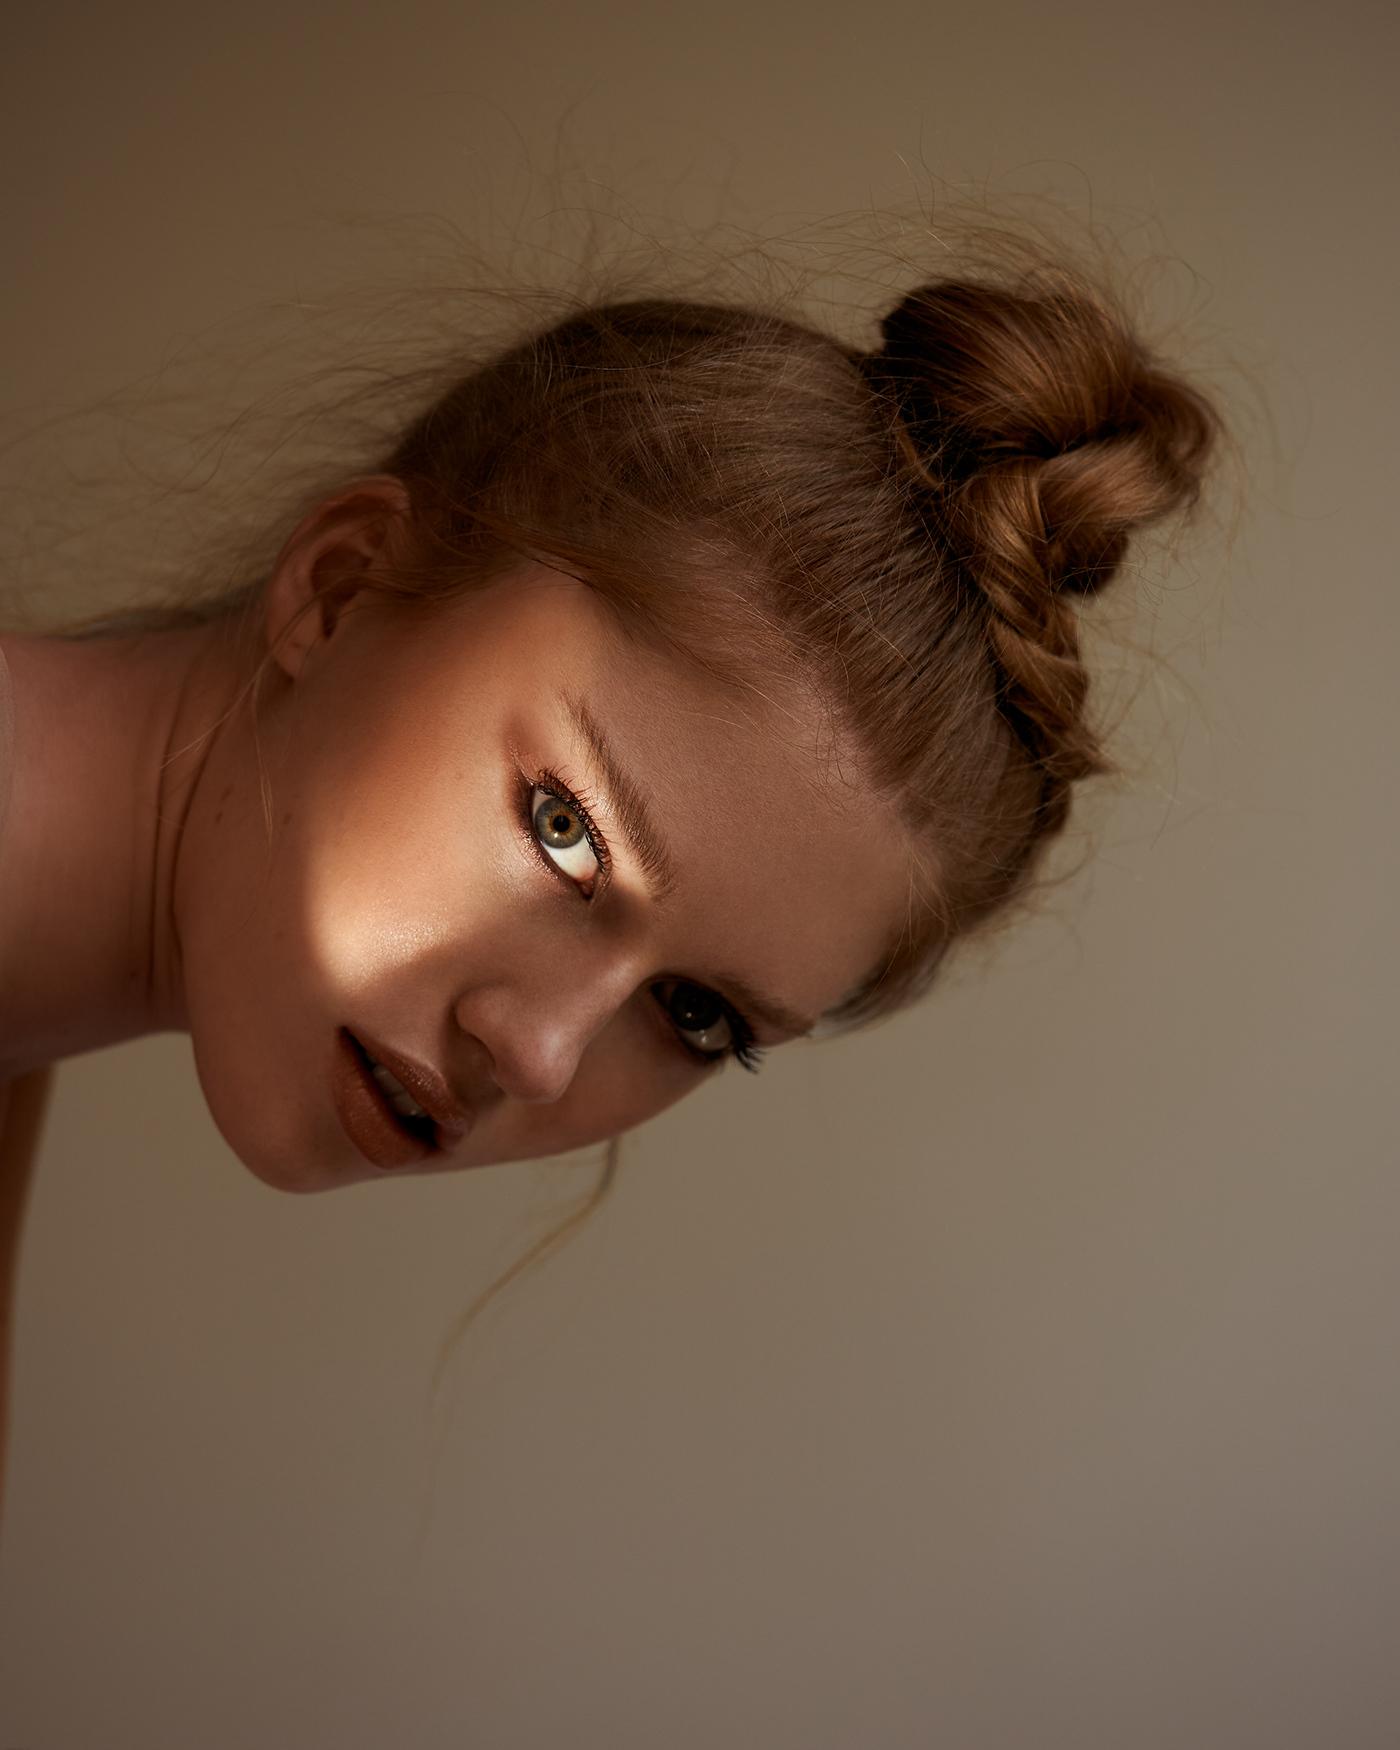 editorial Fashion  hair makeup model naturallight Photography  photoshoot studio woman